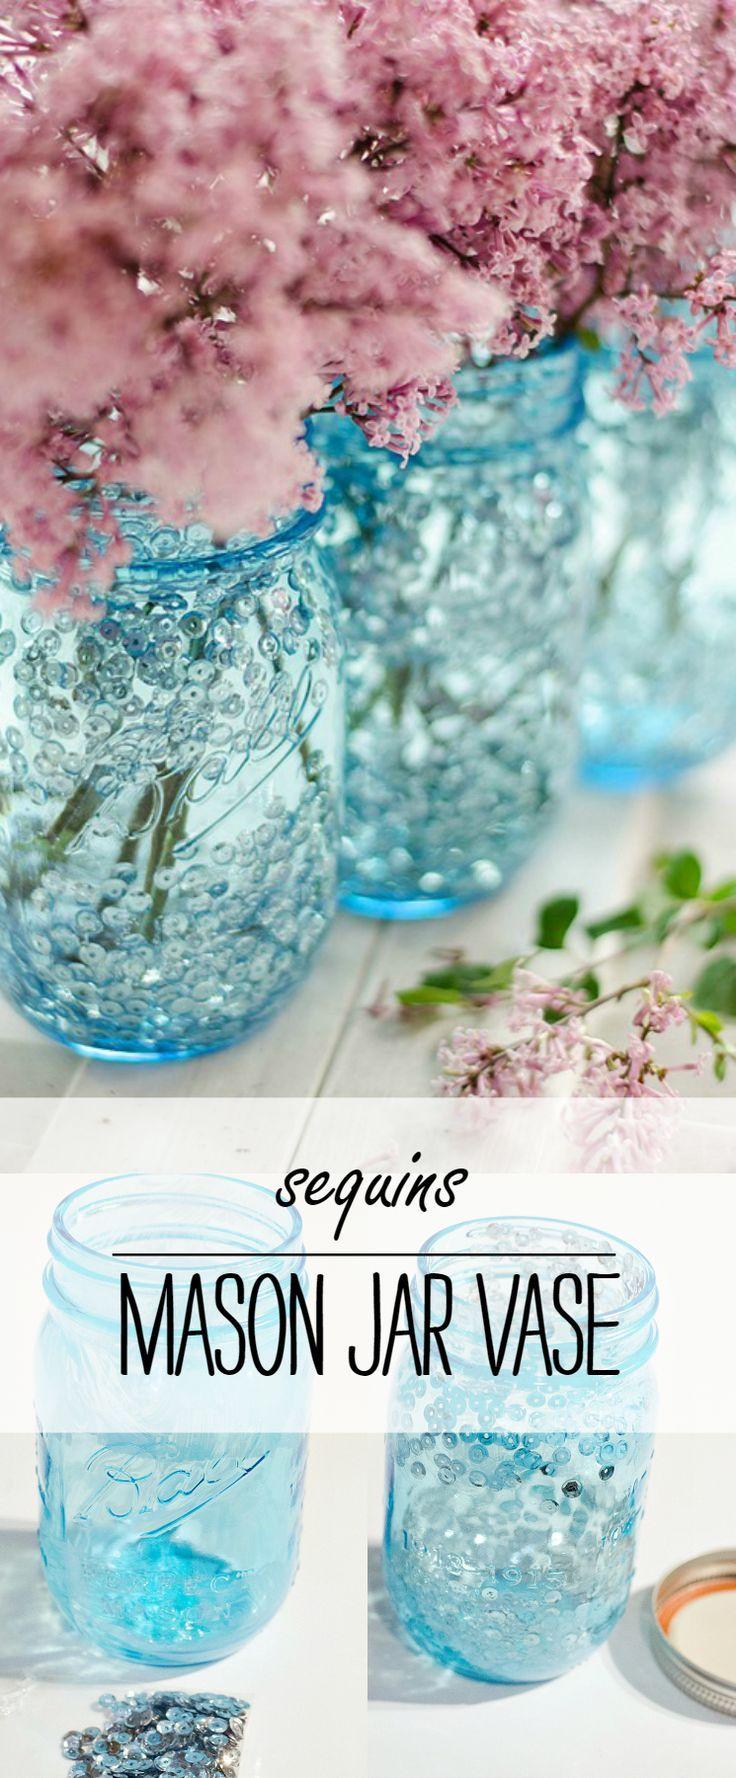 Mason Jar Room Decor Mason Jar Vase  Jar Centerpieces And Mason Jar Vases